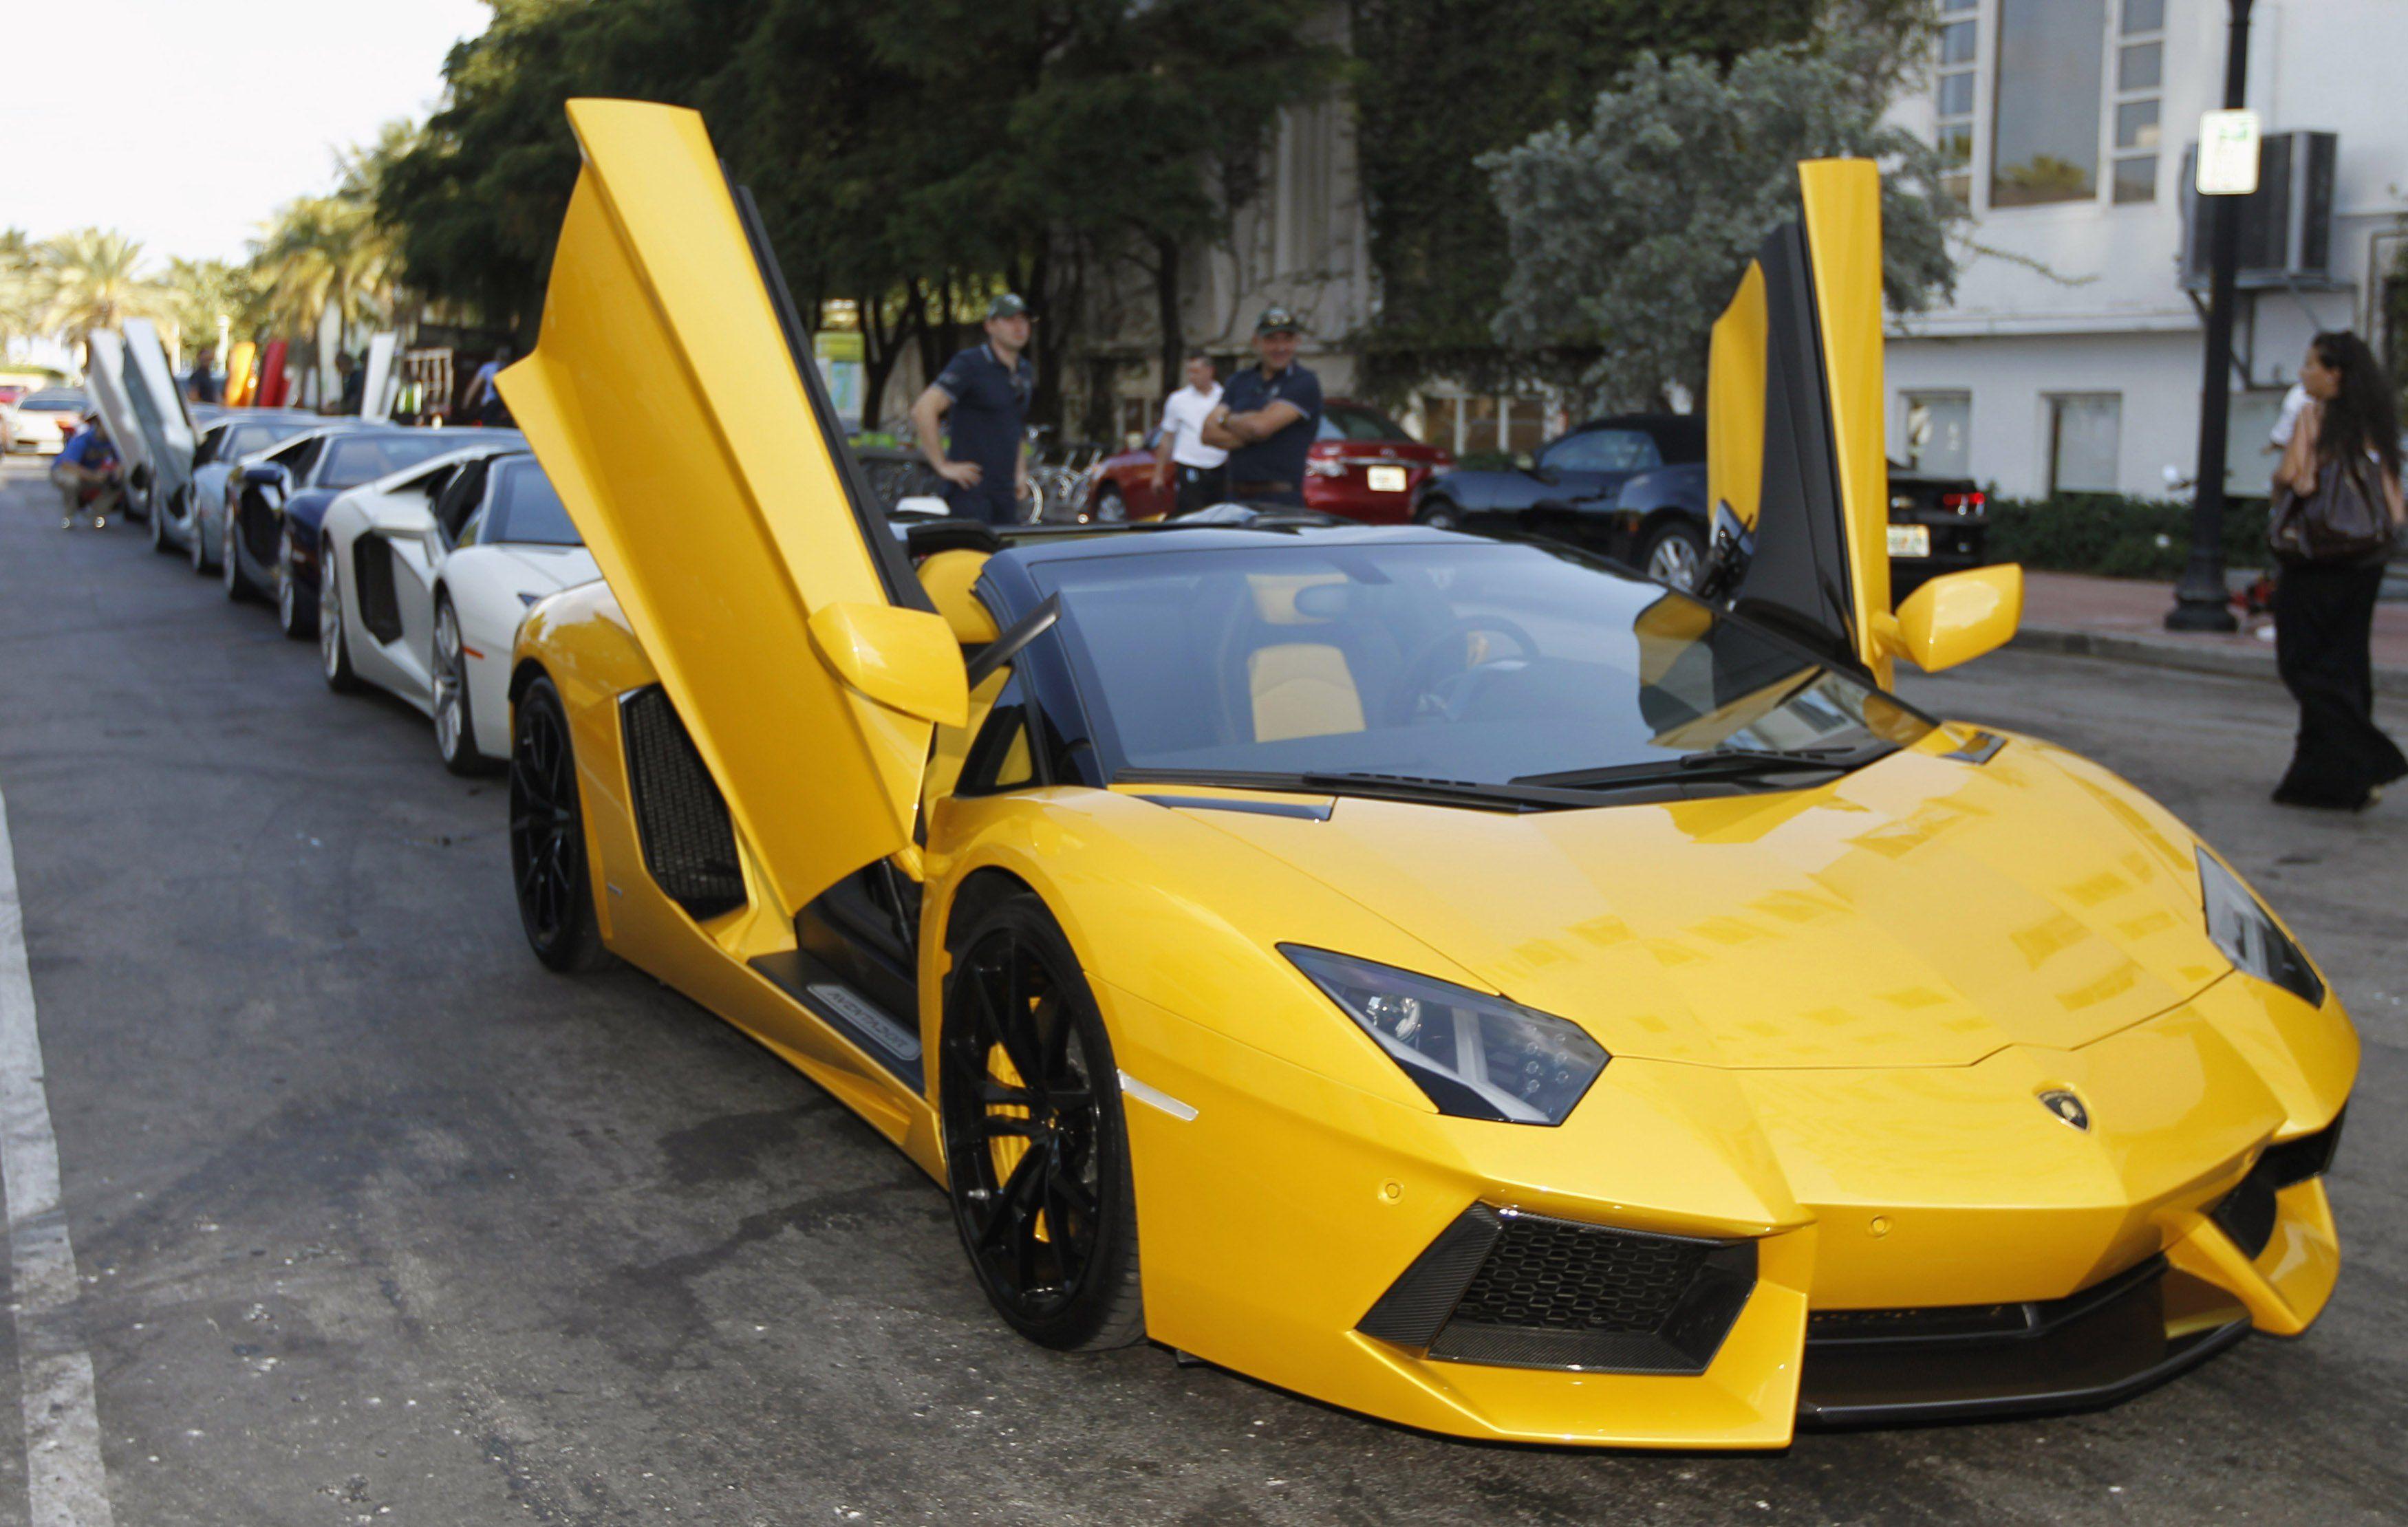 Benefits Of Professional Supercar Hire Southampton In 2020 Super Cars Lamborghini Car In The World